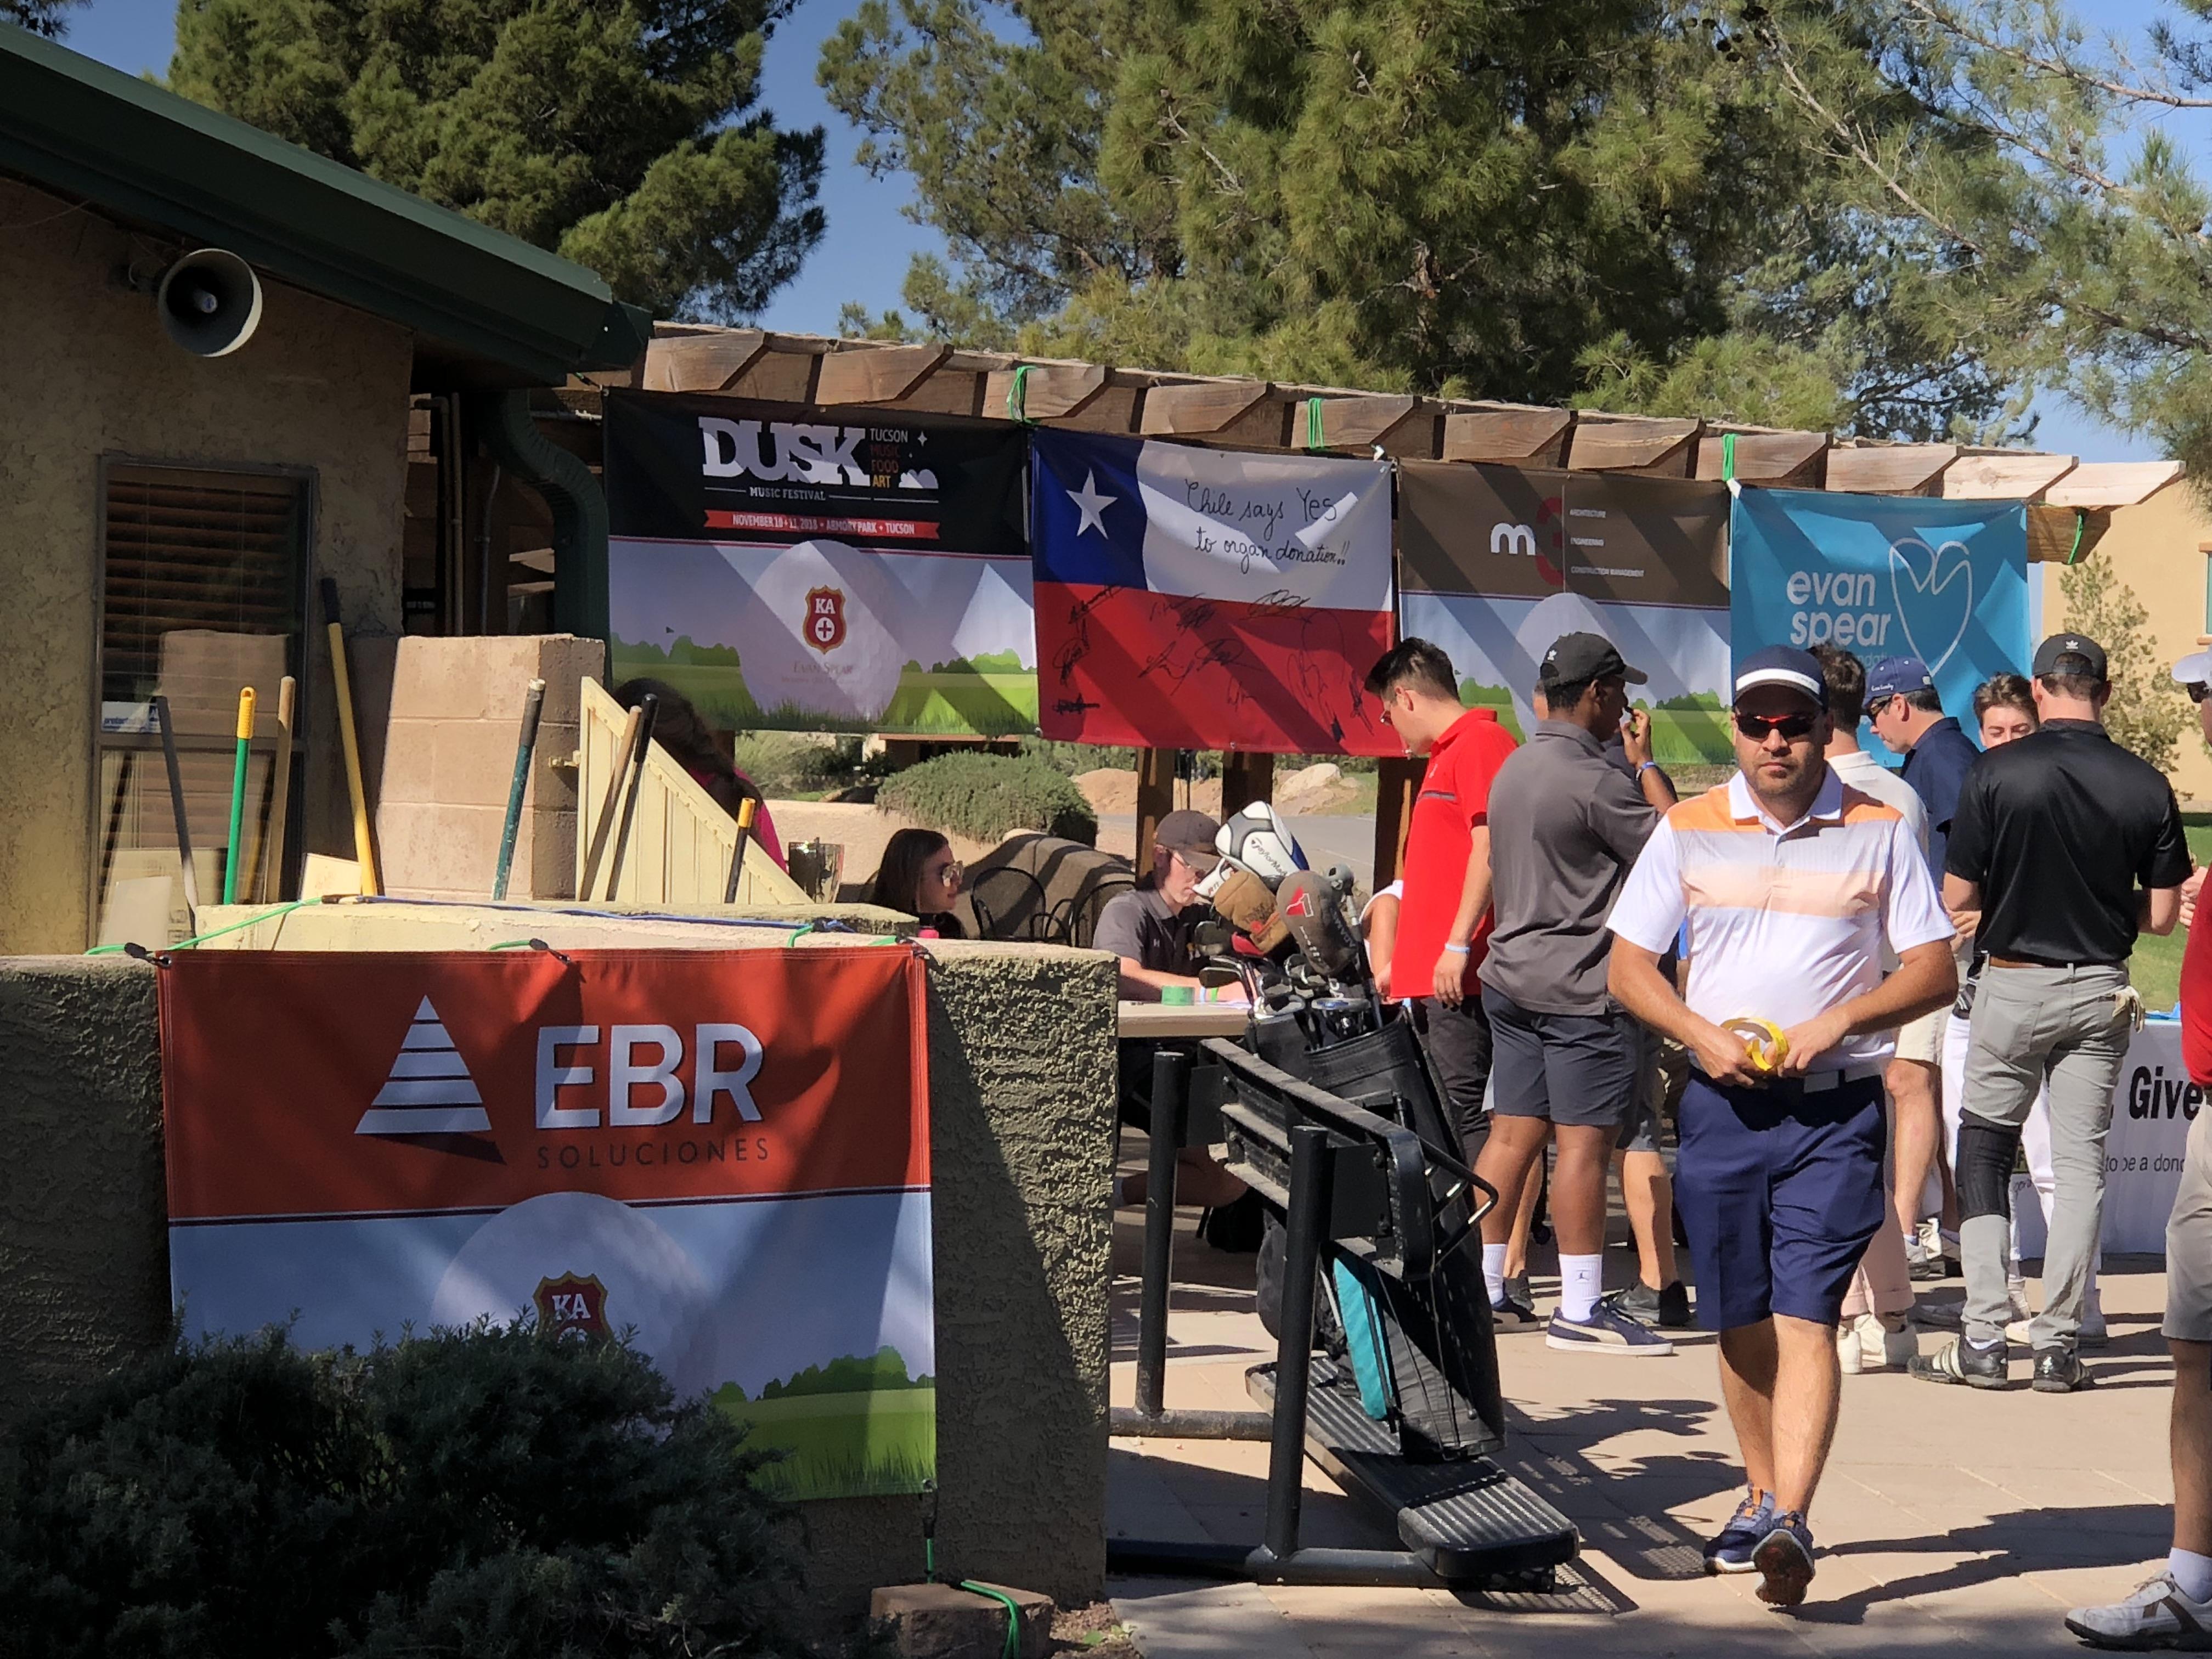 KA - Evan Spear Memorial Golf Tournament gallery image #15